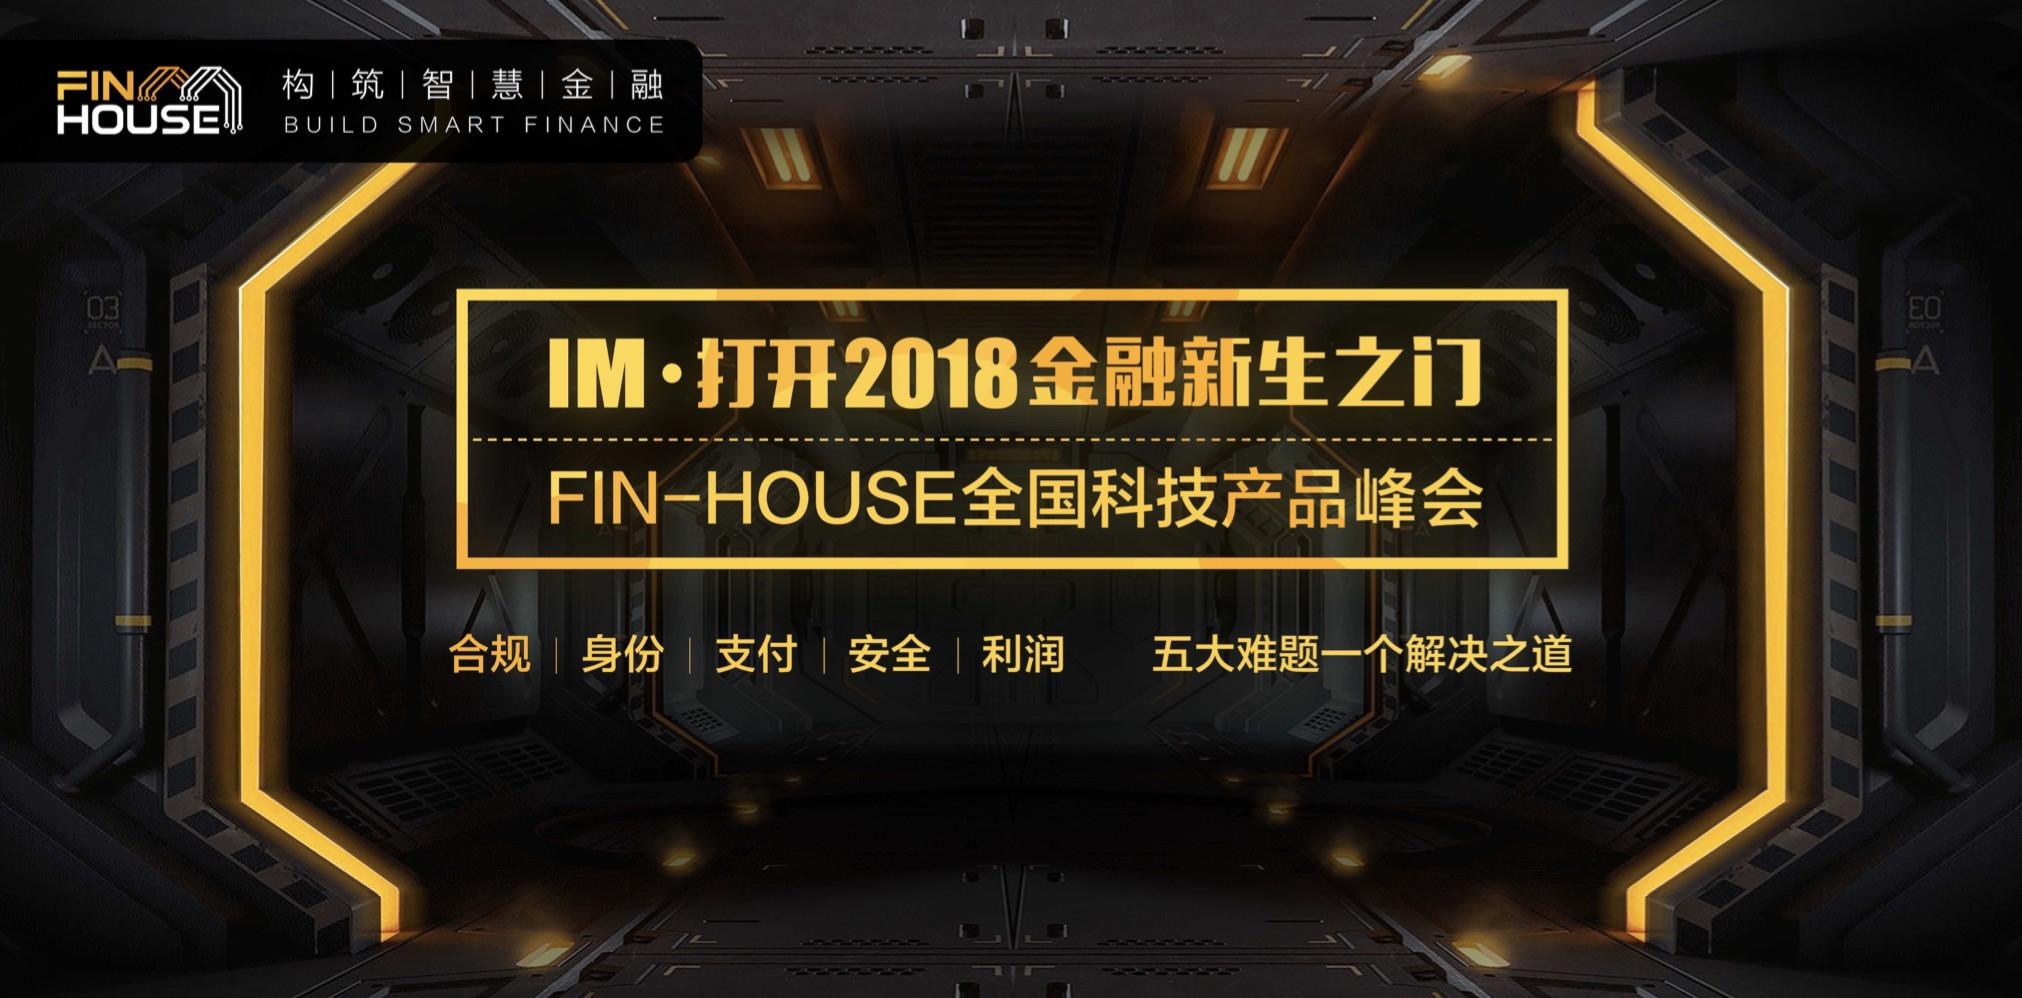 IM-打开2018金融新生之门